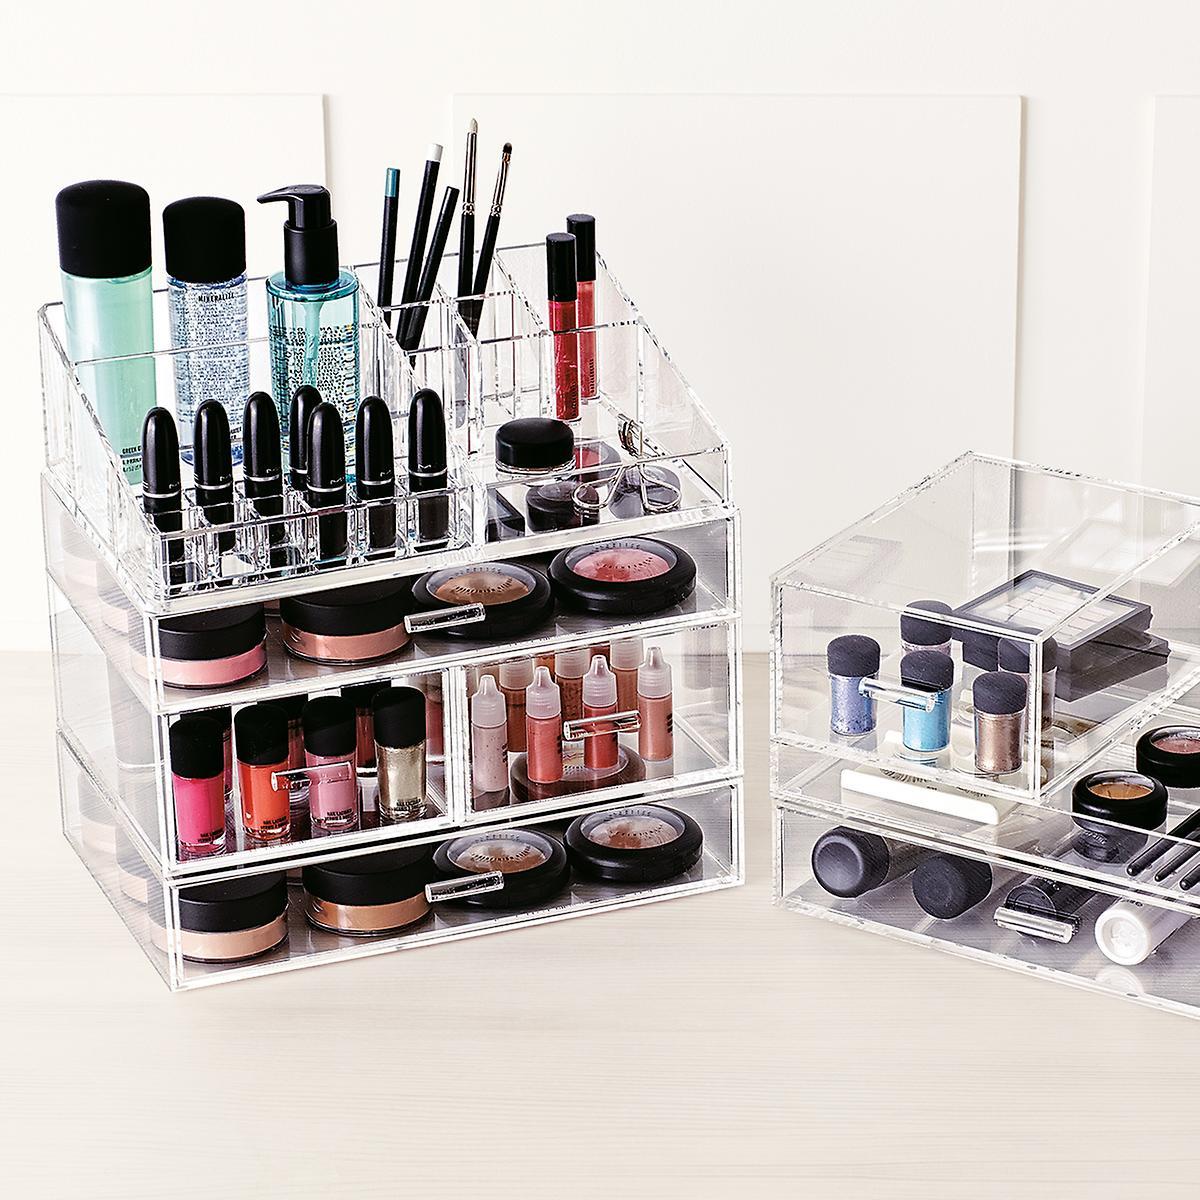 Selecting The Best Makeup Organizer